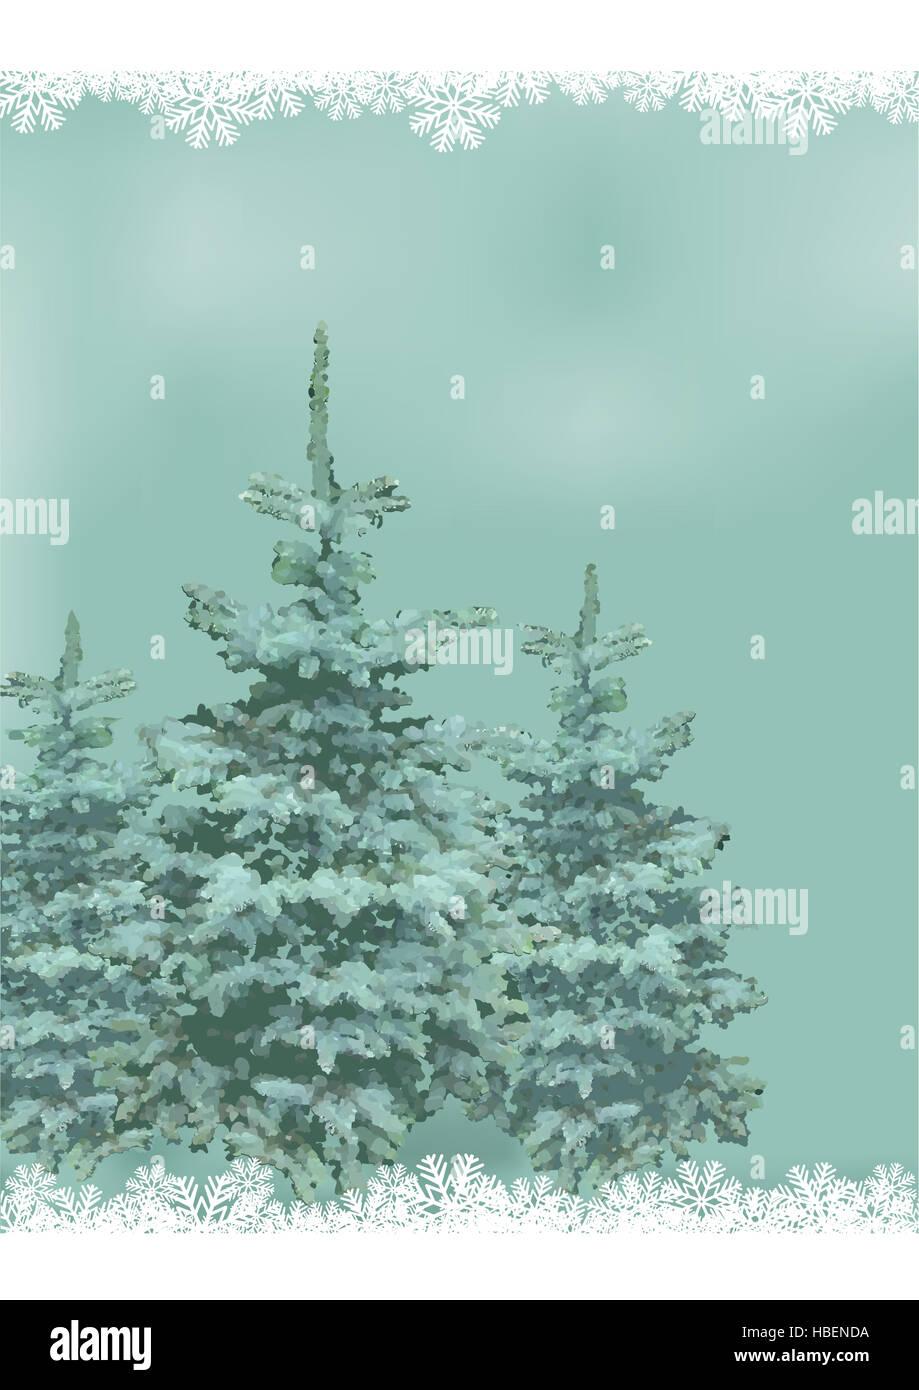 Illustration Christmas landscape. - Stock Image